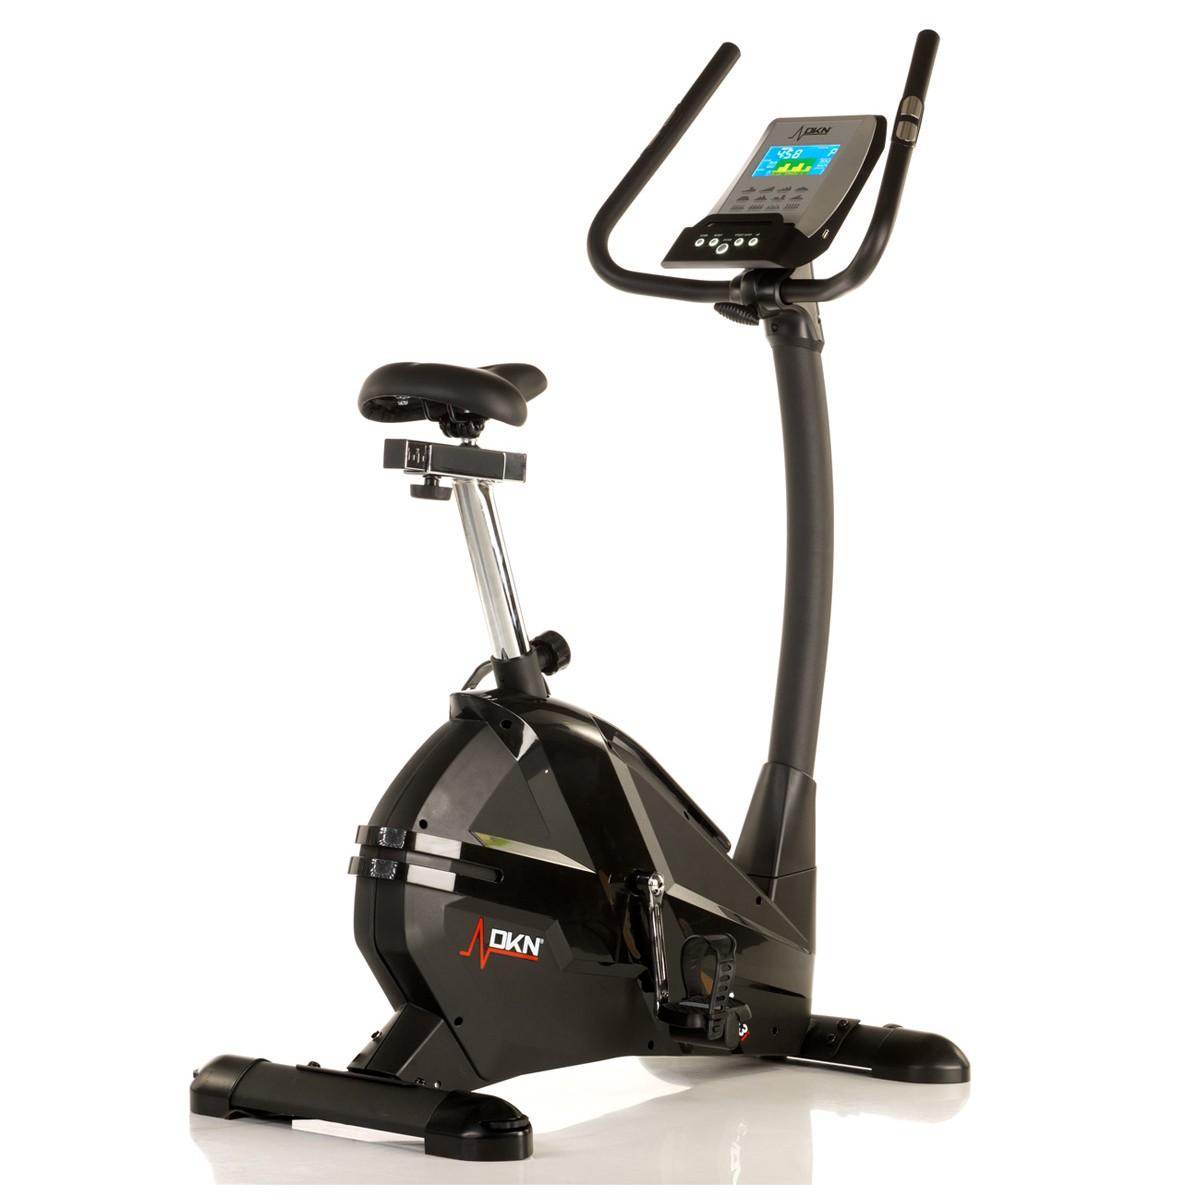 DKN Technology Ergometer AM-3i Hometrainer